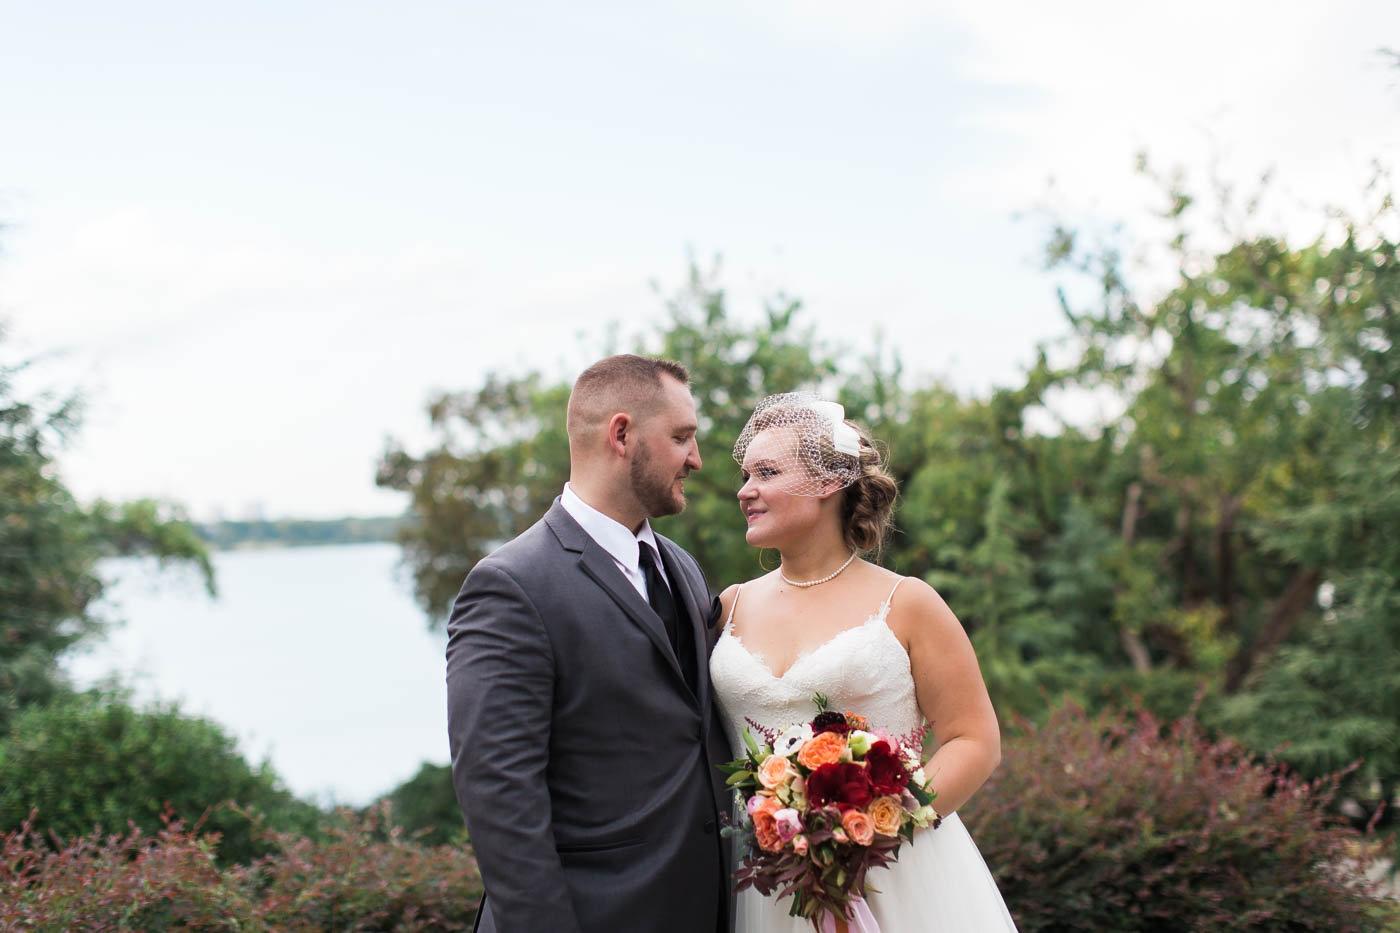 chelsea and chris- dallas arboretum garden wedding-197.jpg